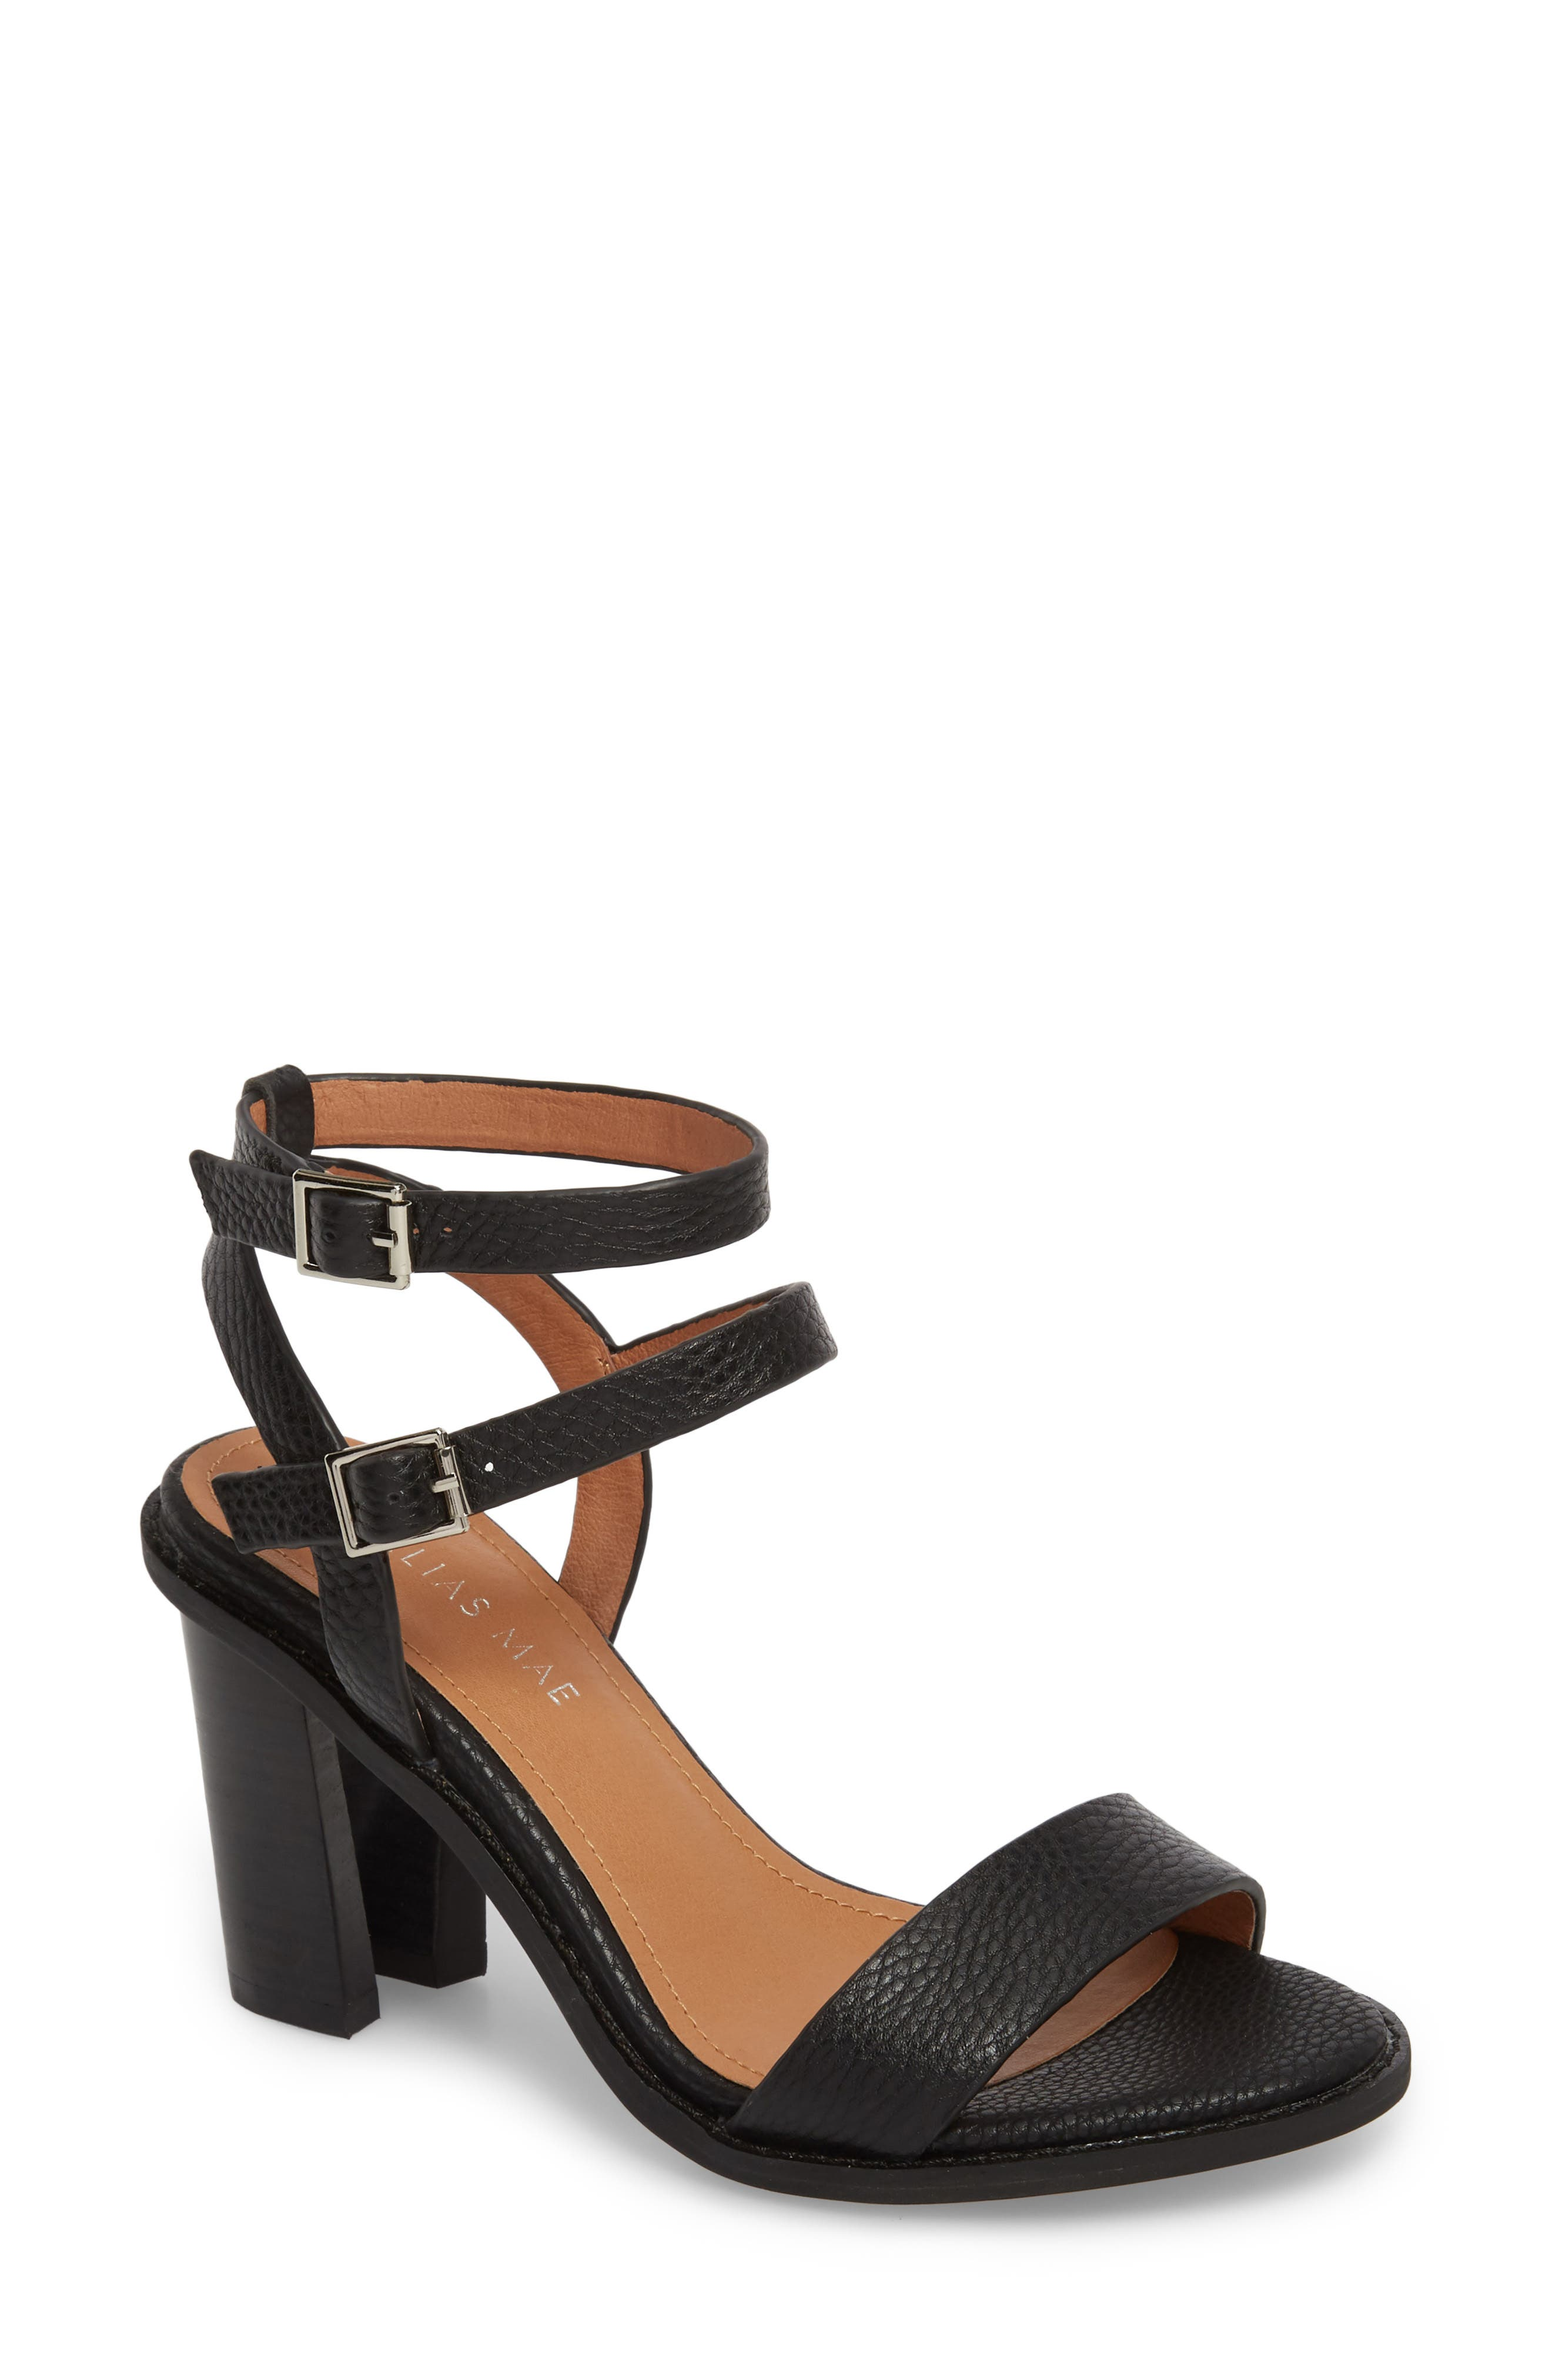 Elapse Sandal,                             Main thumbnail 1, color,                             Black Leather